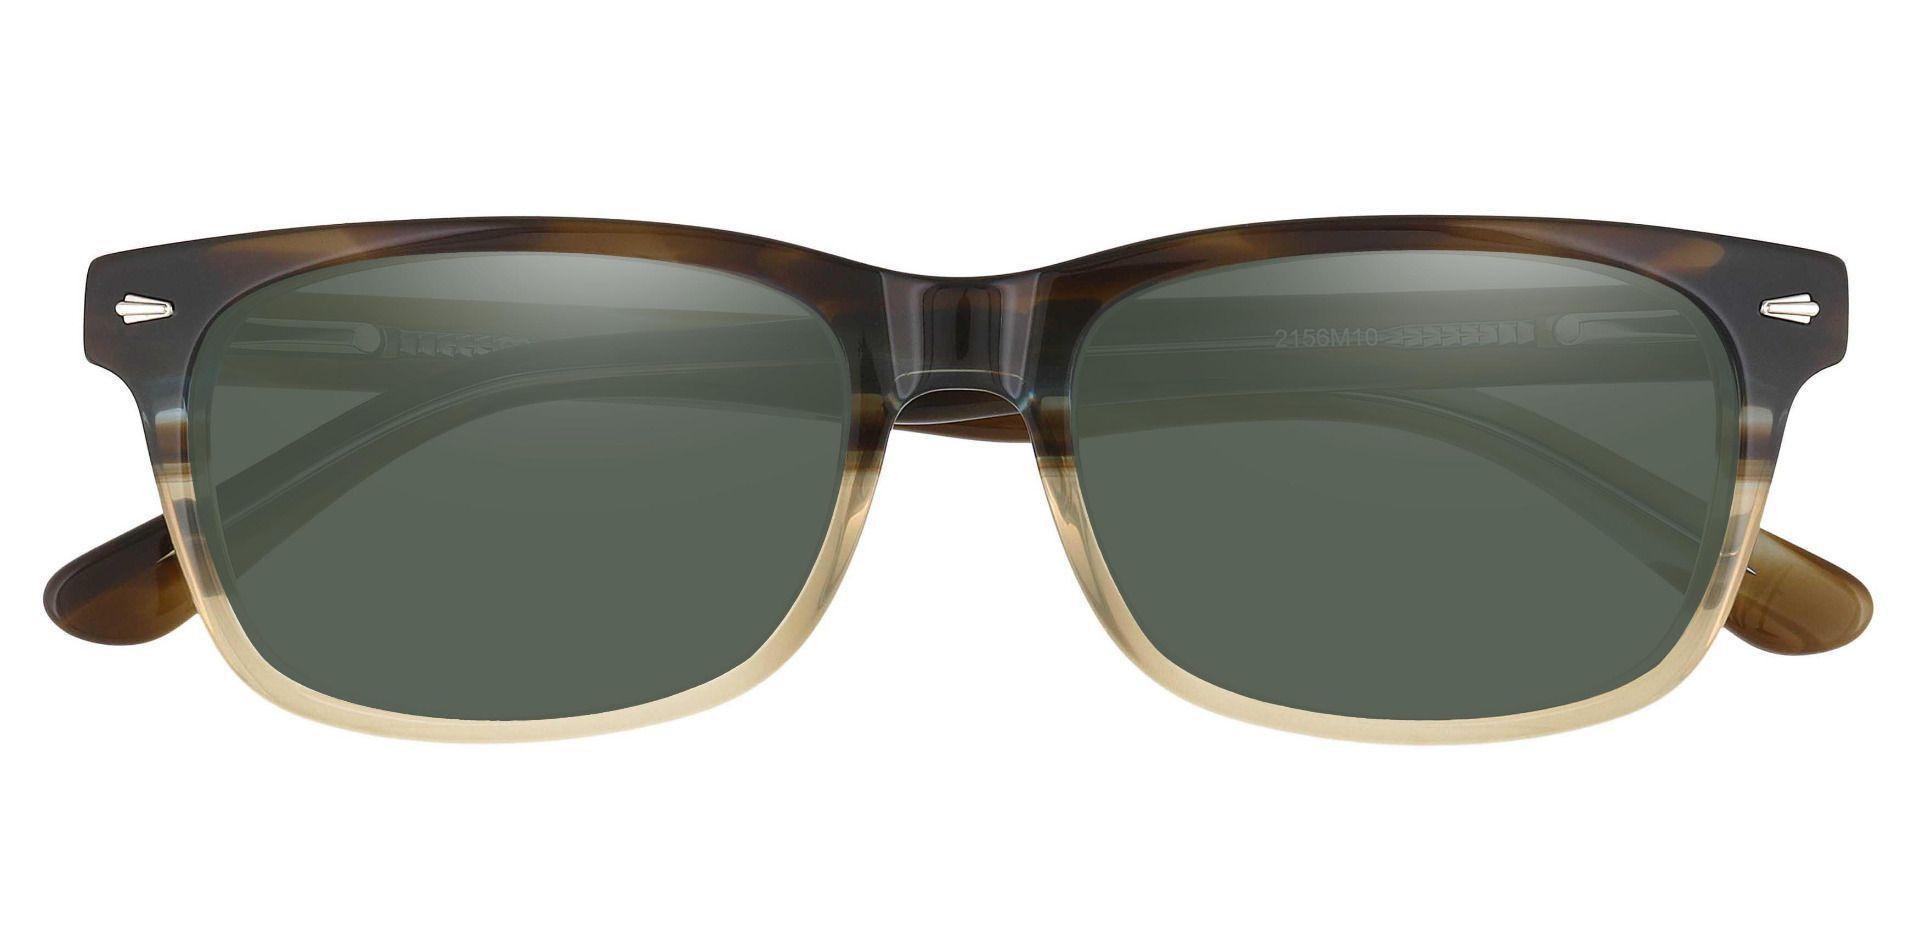 Hendrix Rectangle Reading Sunglasses - Multi Color Frame With Green Lenses